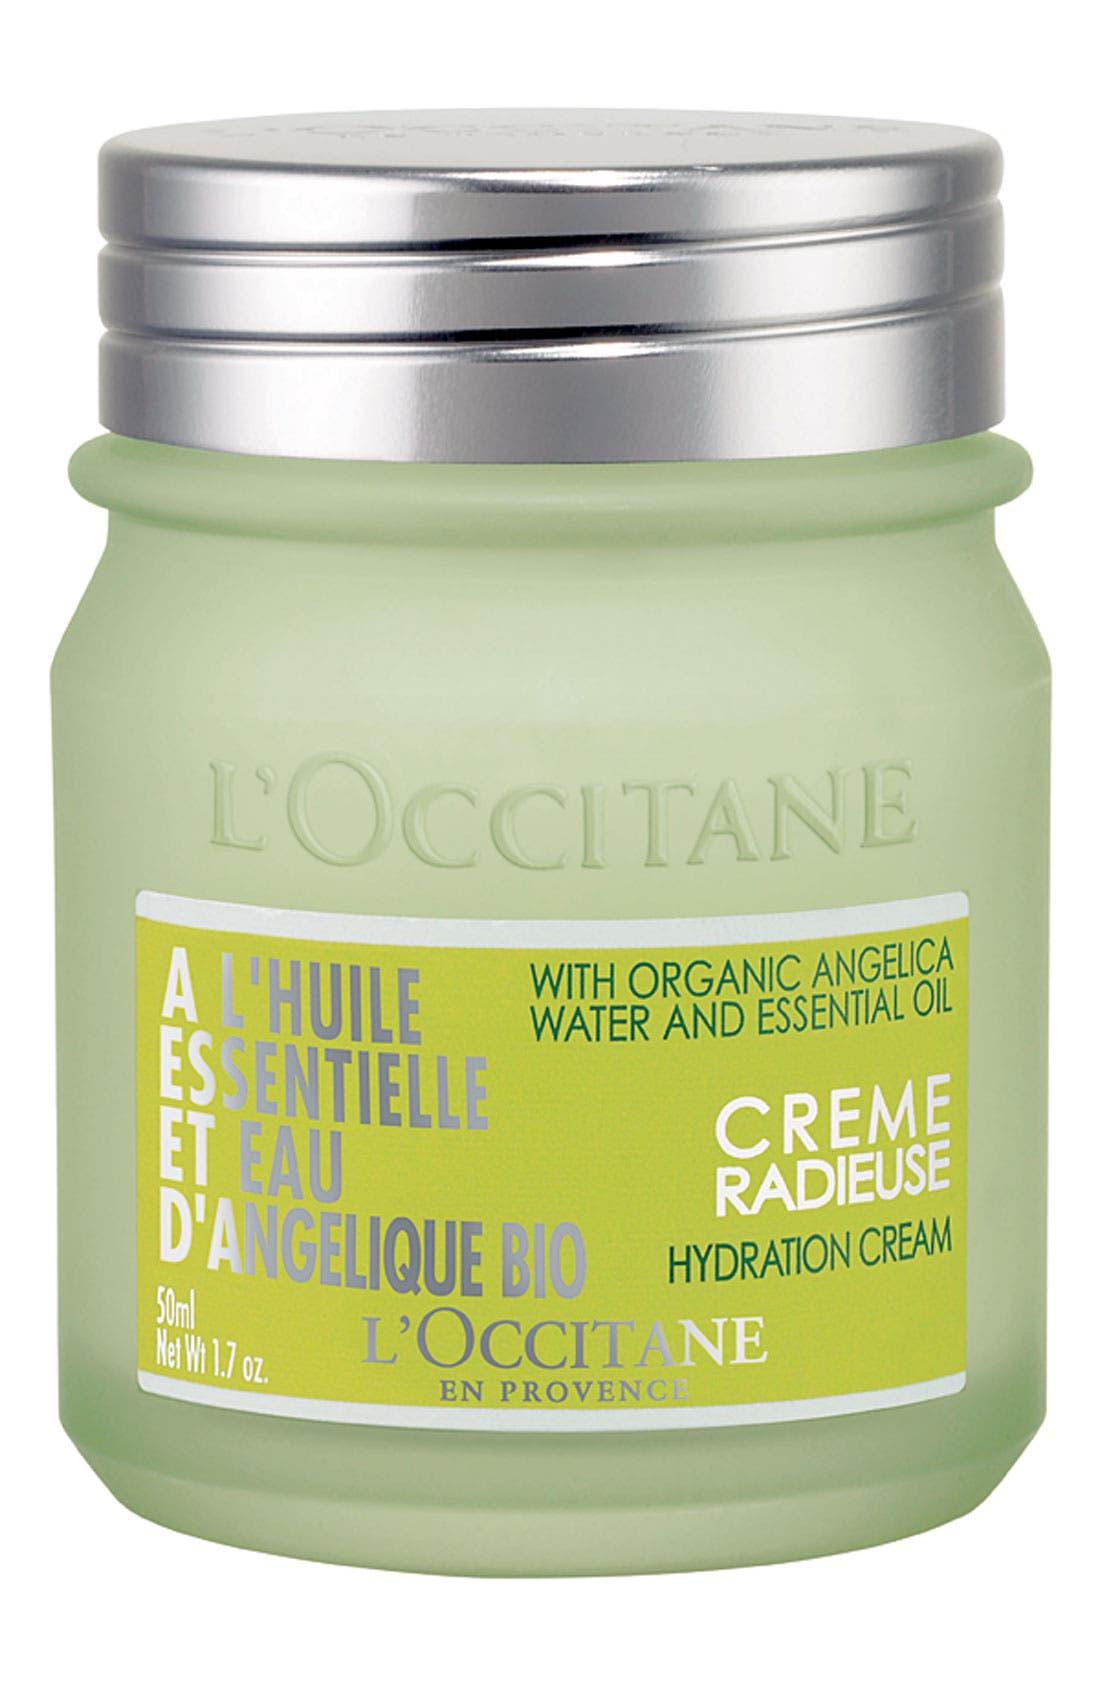 L'OCCITANE, 'Angelica' Hydration Cream, Main thumbnail 1, color, 000